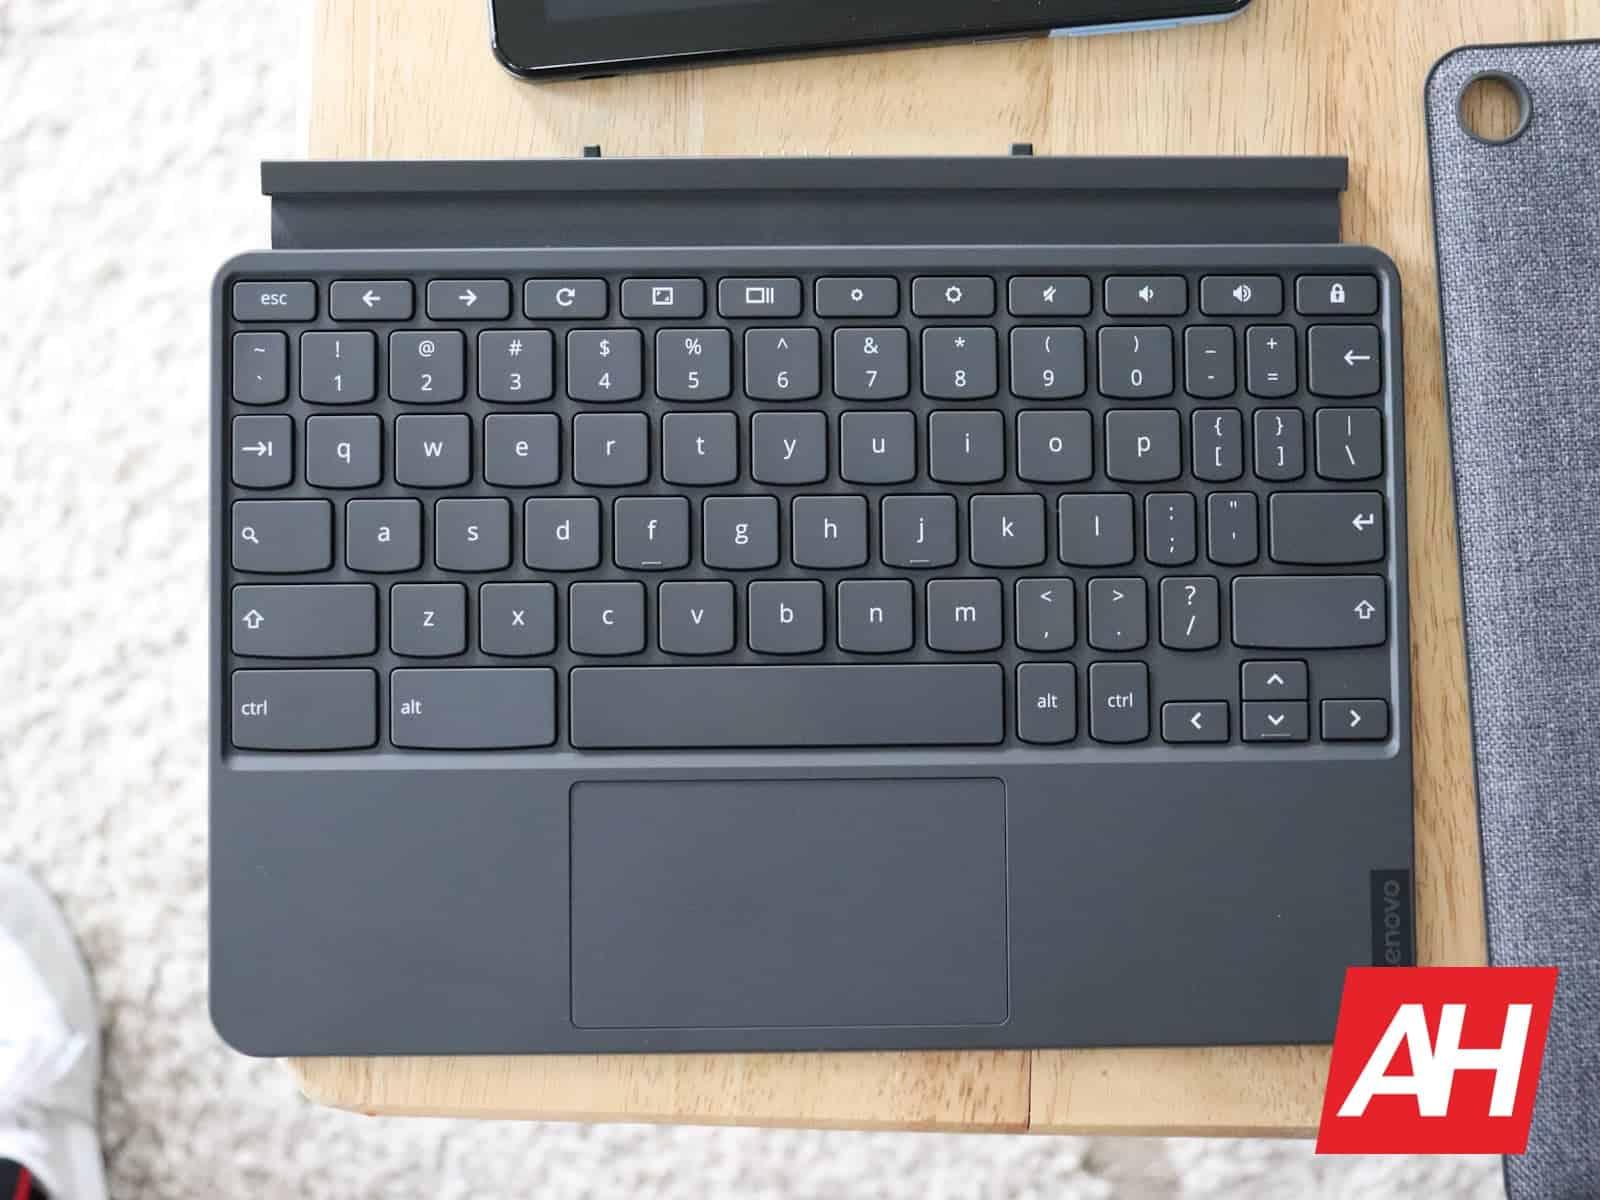 03 0 Lenovo IdeaPad Duet Hardware AH 2020